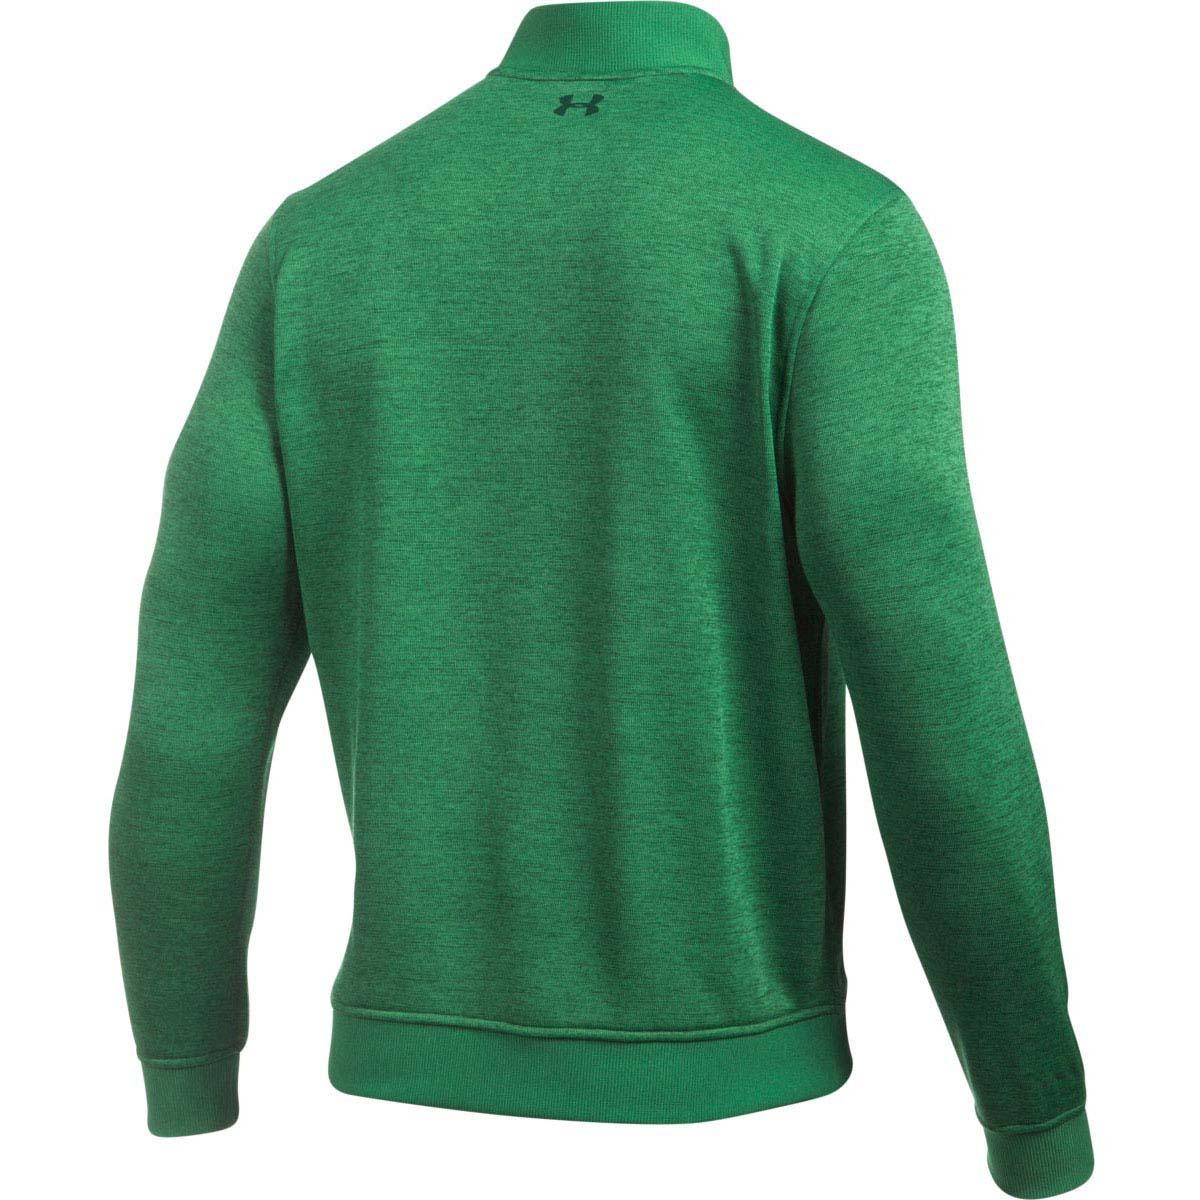 Under-Armour-Mens-UA-Storm-Sweater-Fleece-1-4-Zip-Pullover-Jumper-25-OFF-RRP thumbnail 28